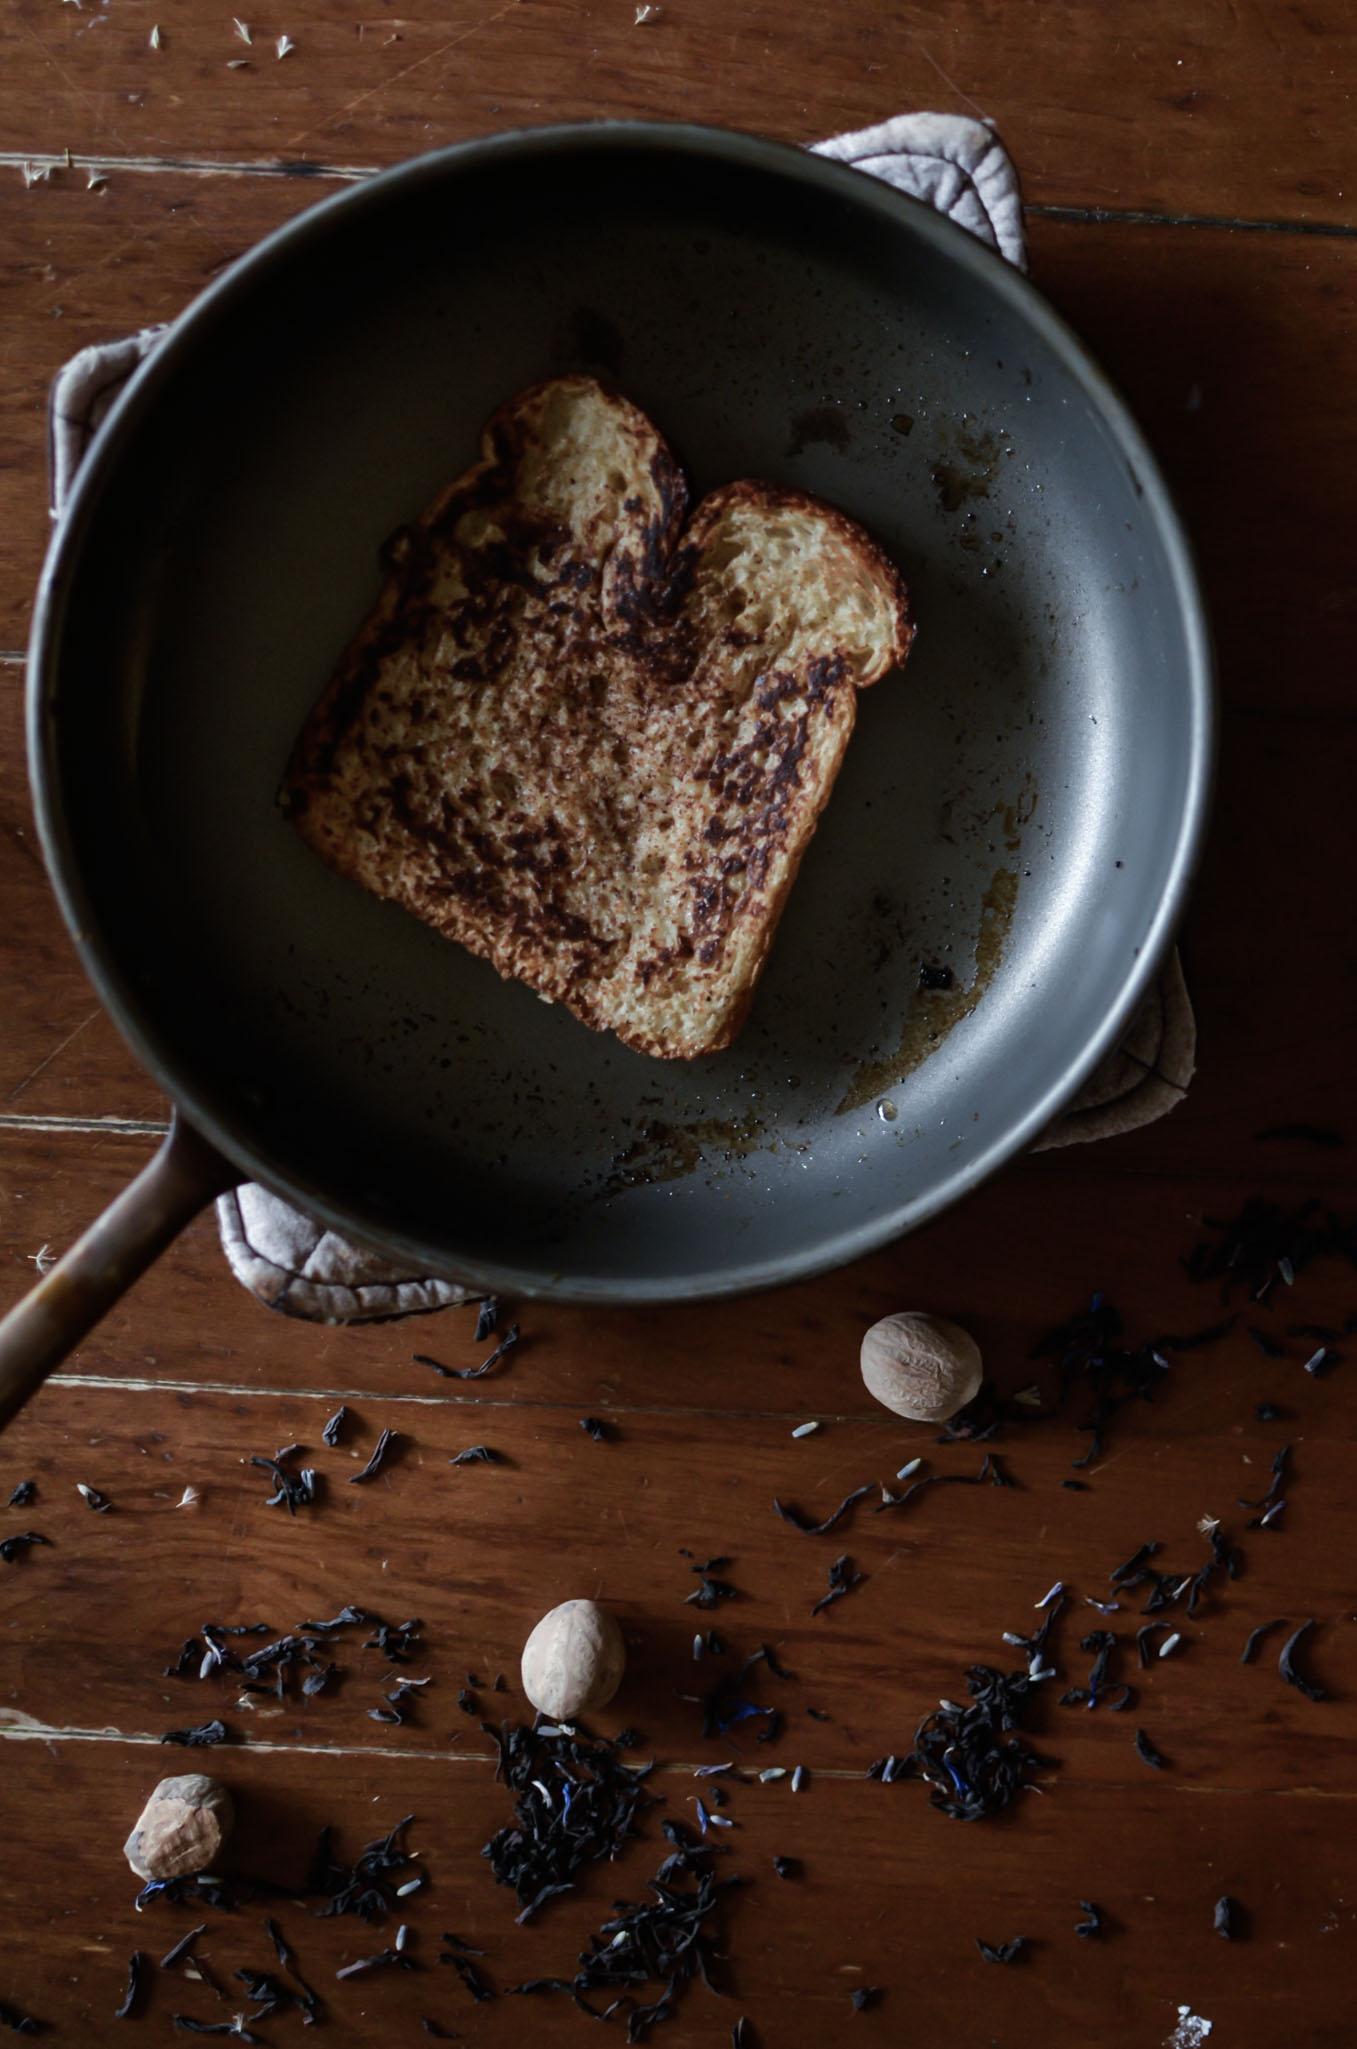 Wendling_Boyd_Queens_Guard_French_Toast11.jpg